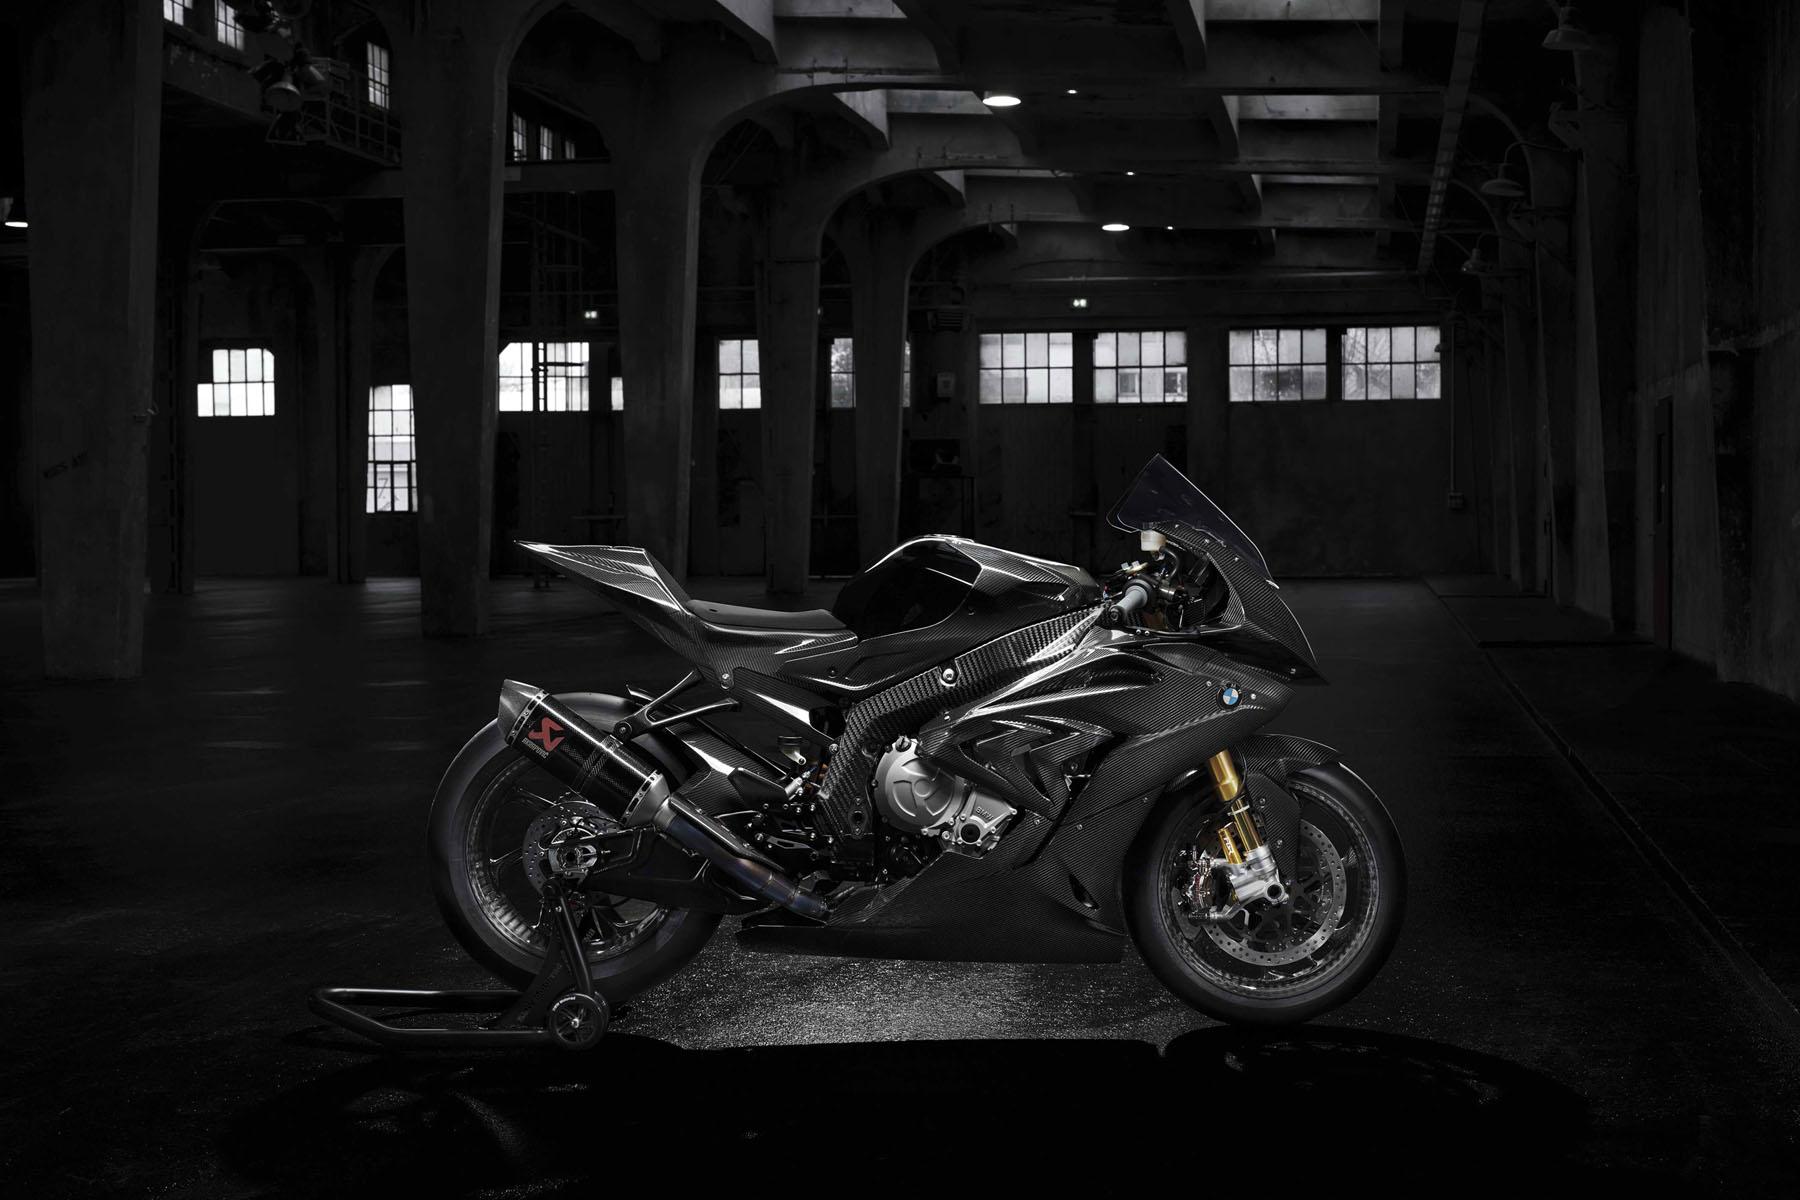 bmw-s1000rr-hp4-race-1